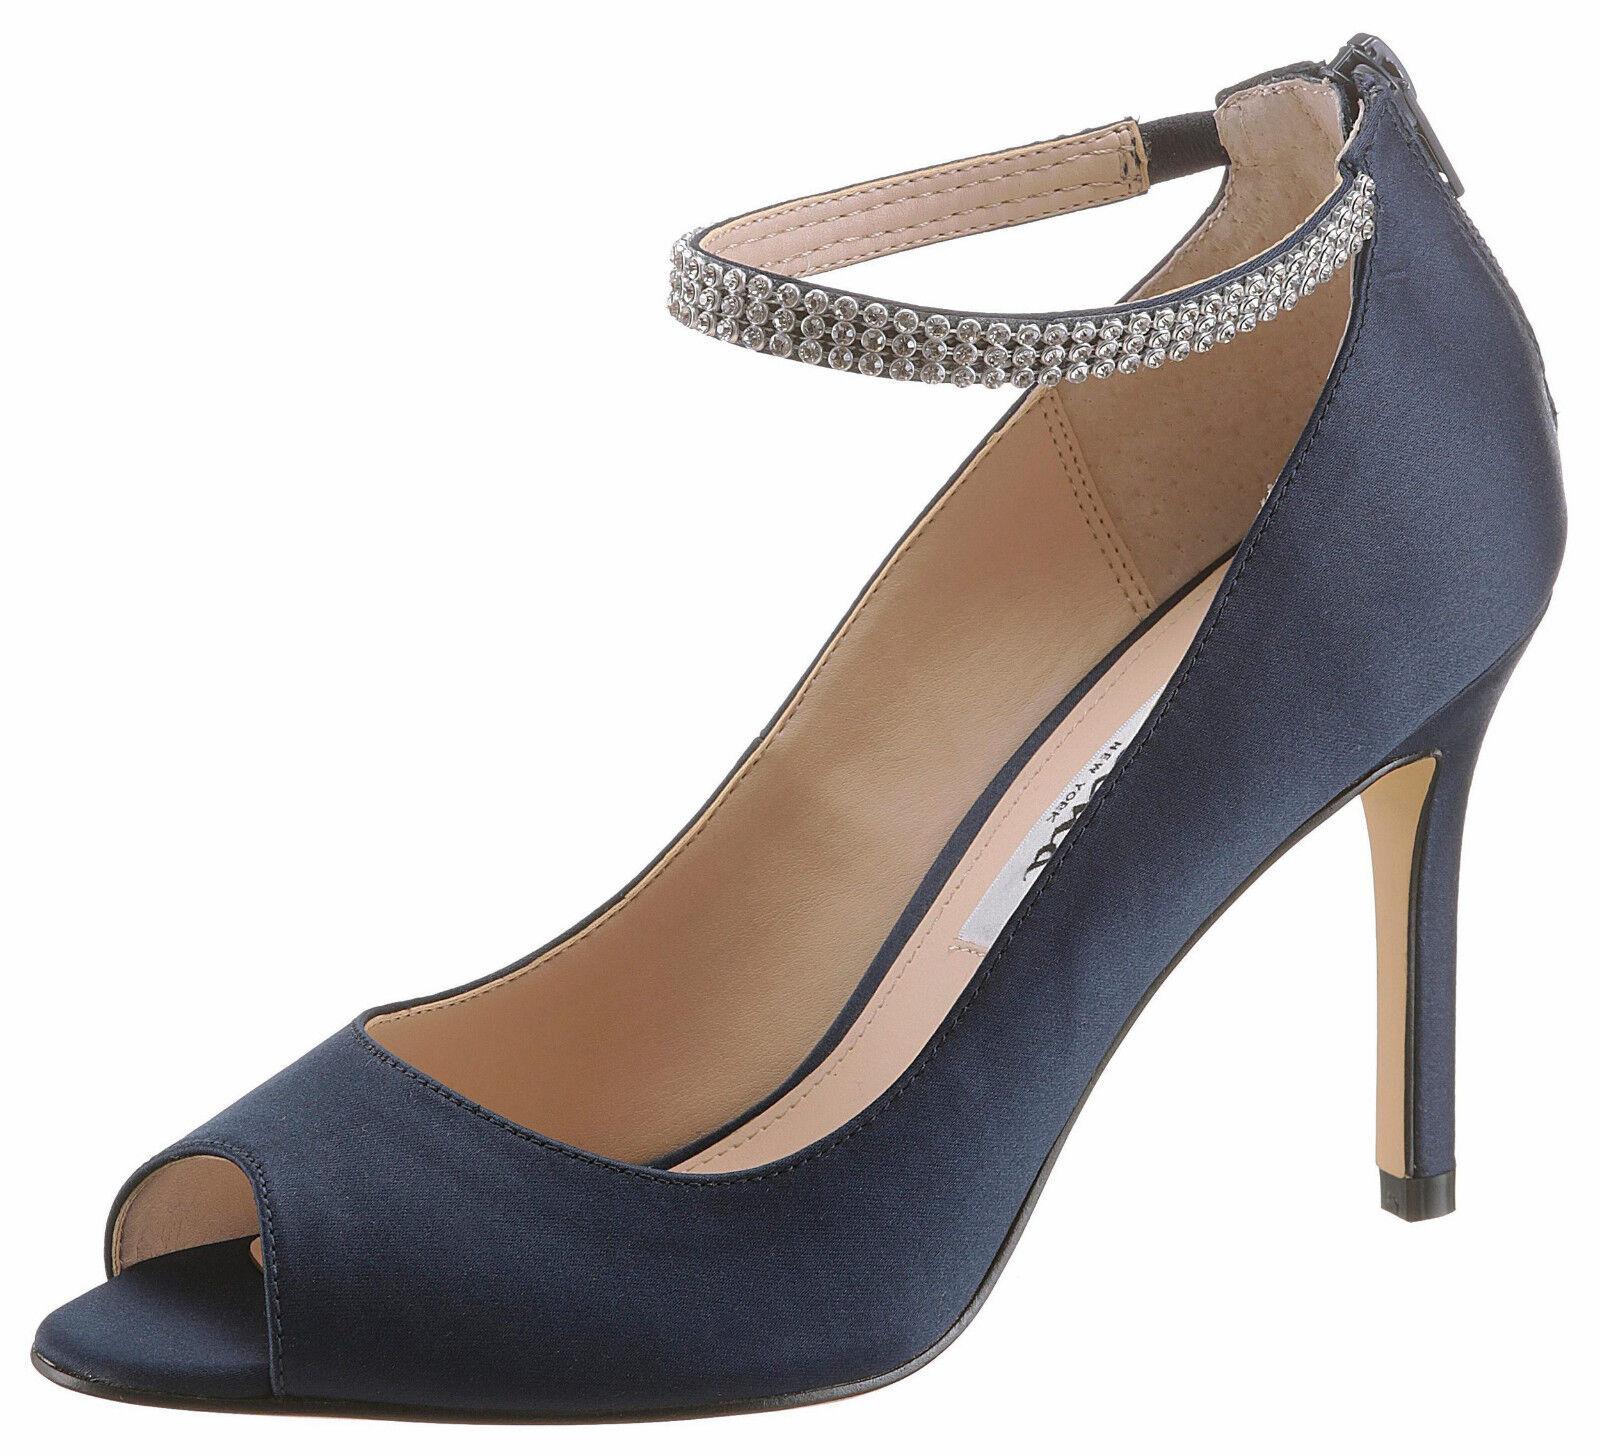 Zapatos de salón, Nina Nina Nina peeptoepumps, con brillantes con tiras, talla 38, textil  al precio mas bajo